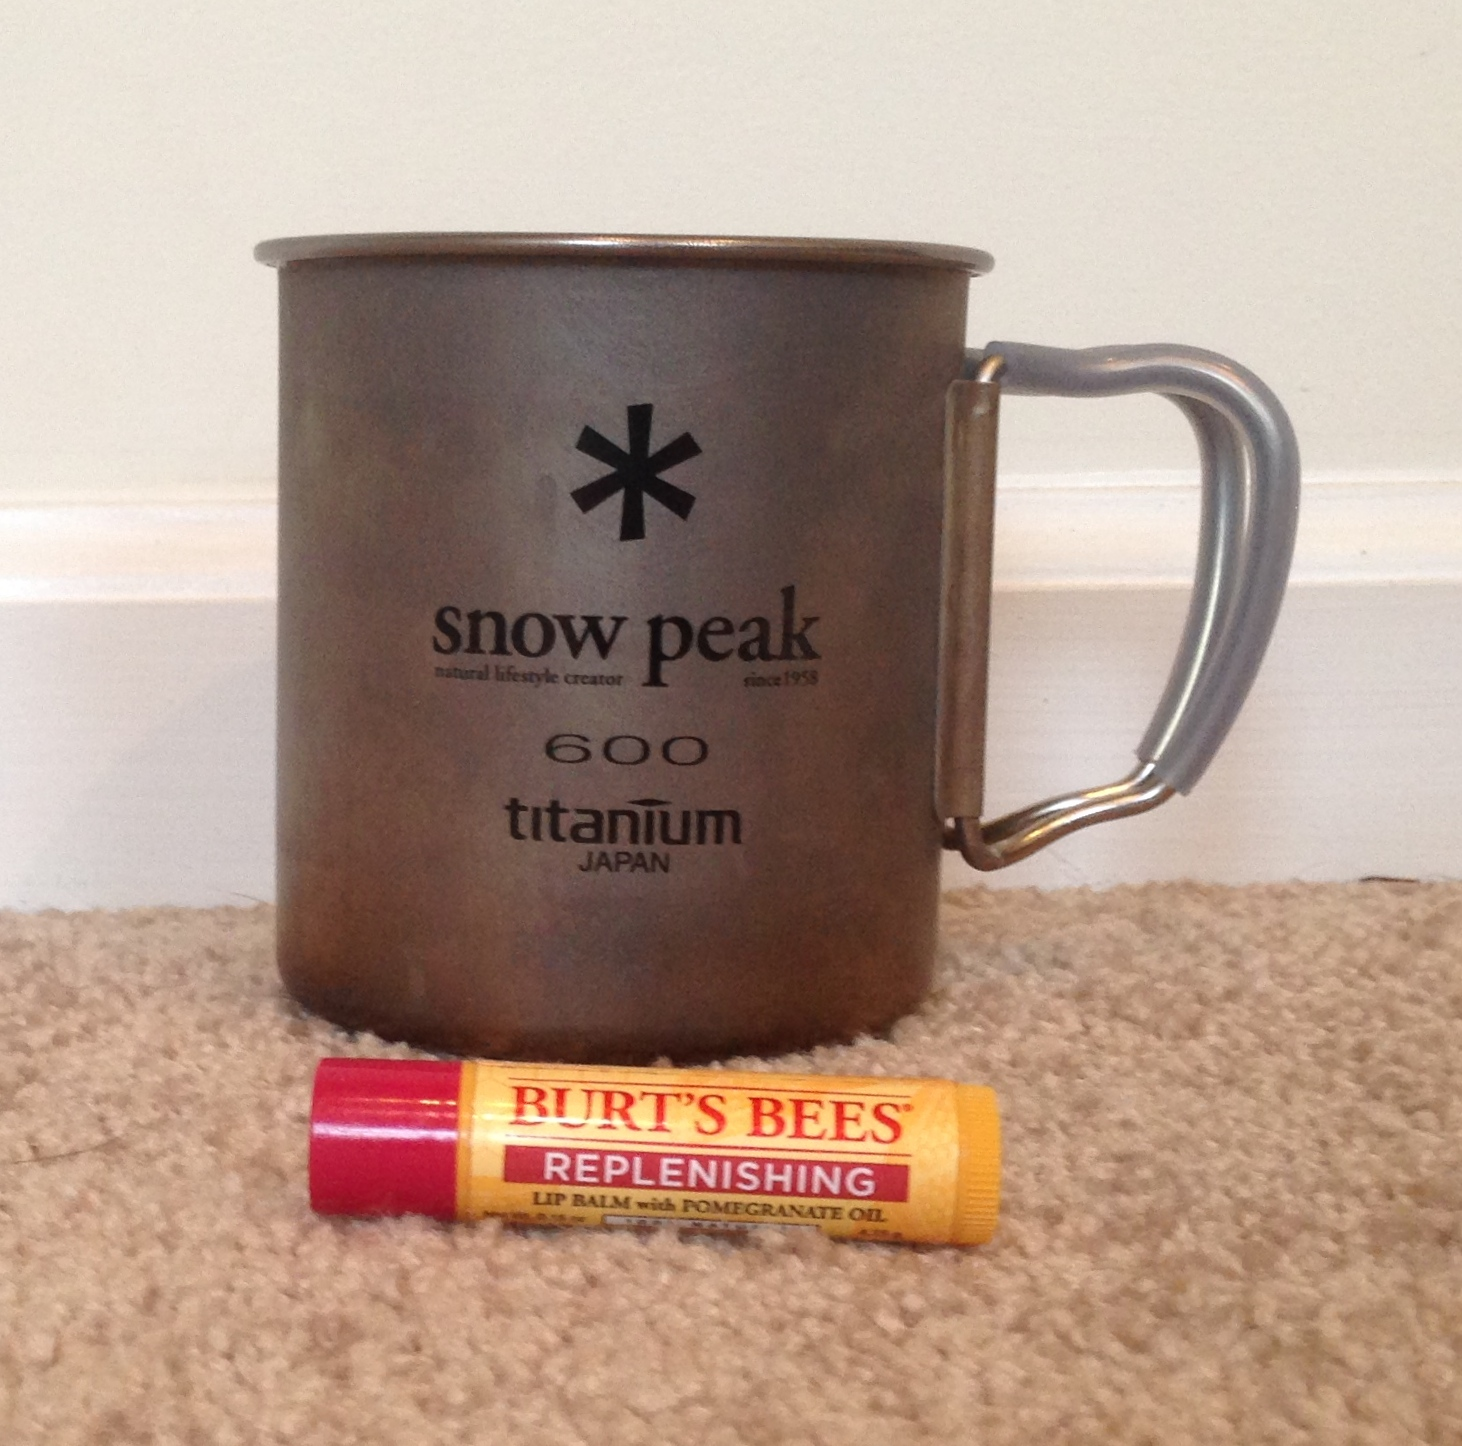 Snow Peak no lid